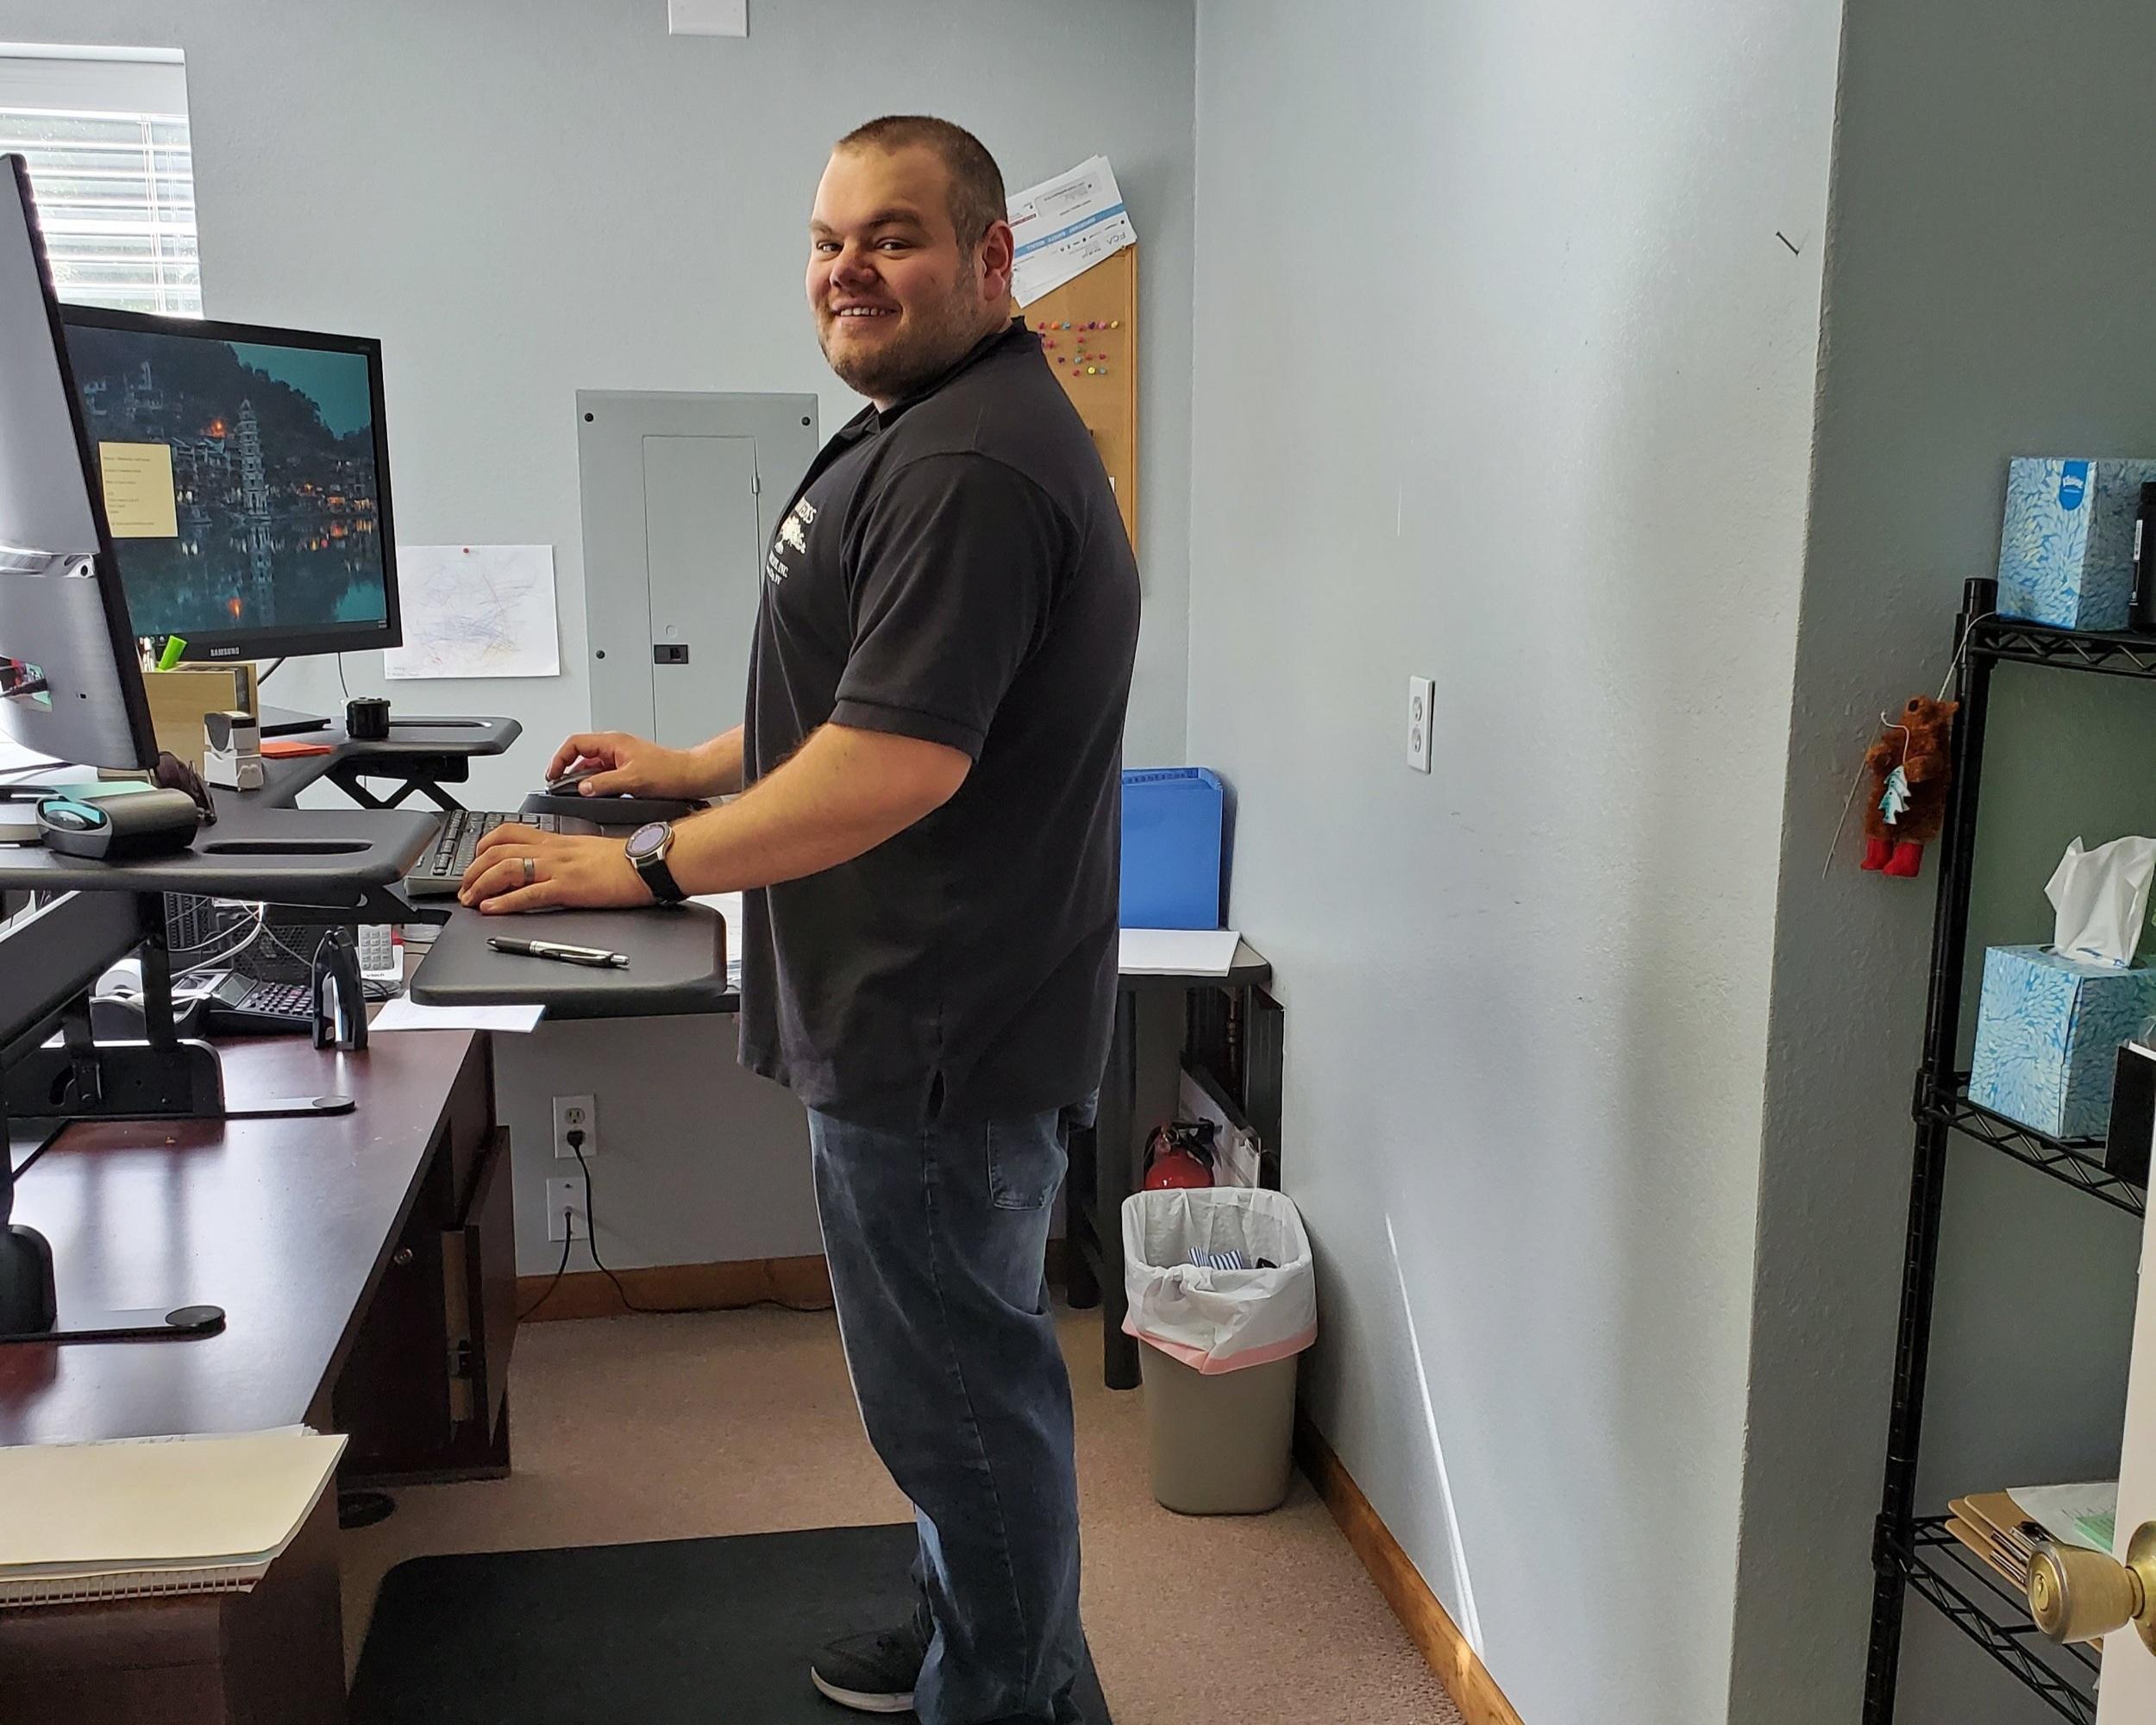 - Ben Ediss, Project Manager(775) 790-0850; ben@tomedisslandscape.com